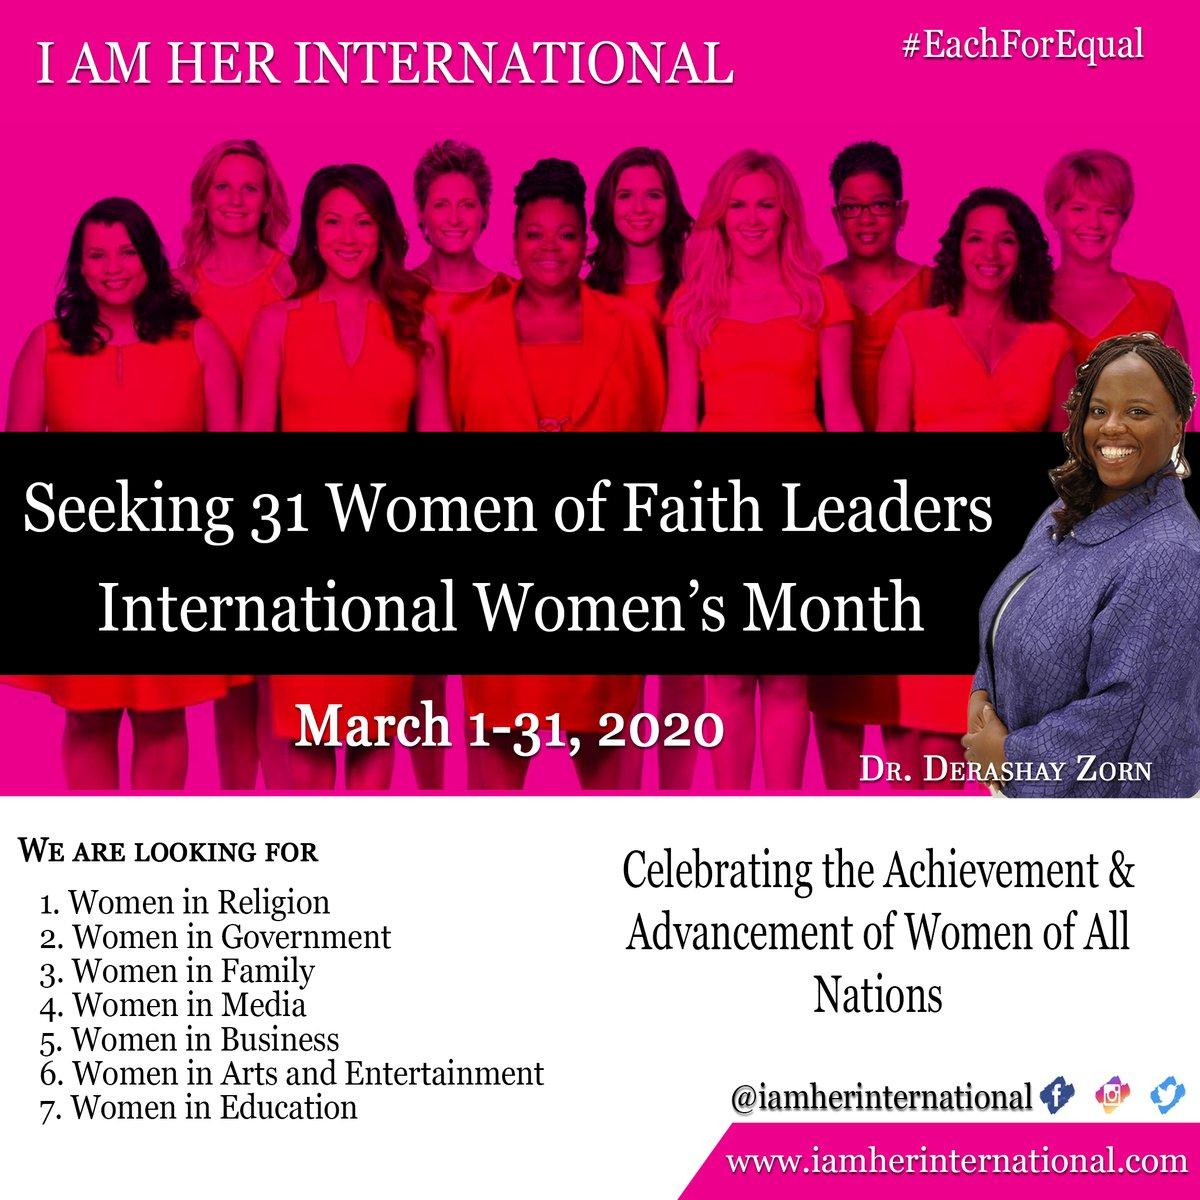 Are You H.E.R.   #iamher #31waysofinfluence #womenofinfluence #womenempowerment #women #womensupportingwomen #womeninbusiness #love #selflove #motivation #entrepreneur #empoweringwomen #womeninspiringwomen #selfcare #womenentrepreneurs #empowerment #womenhelpingwomen #equality